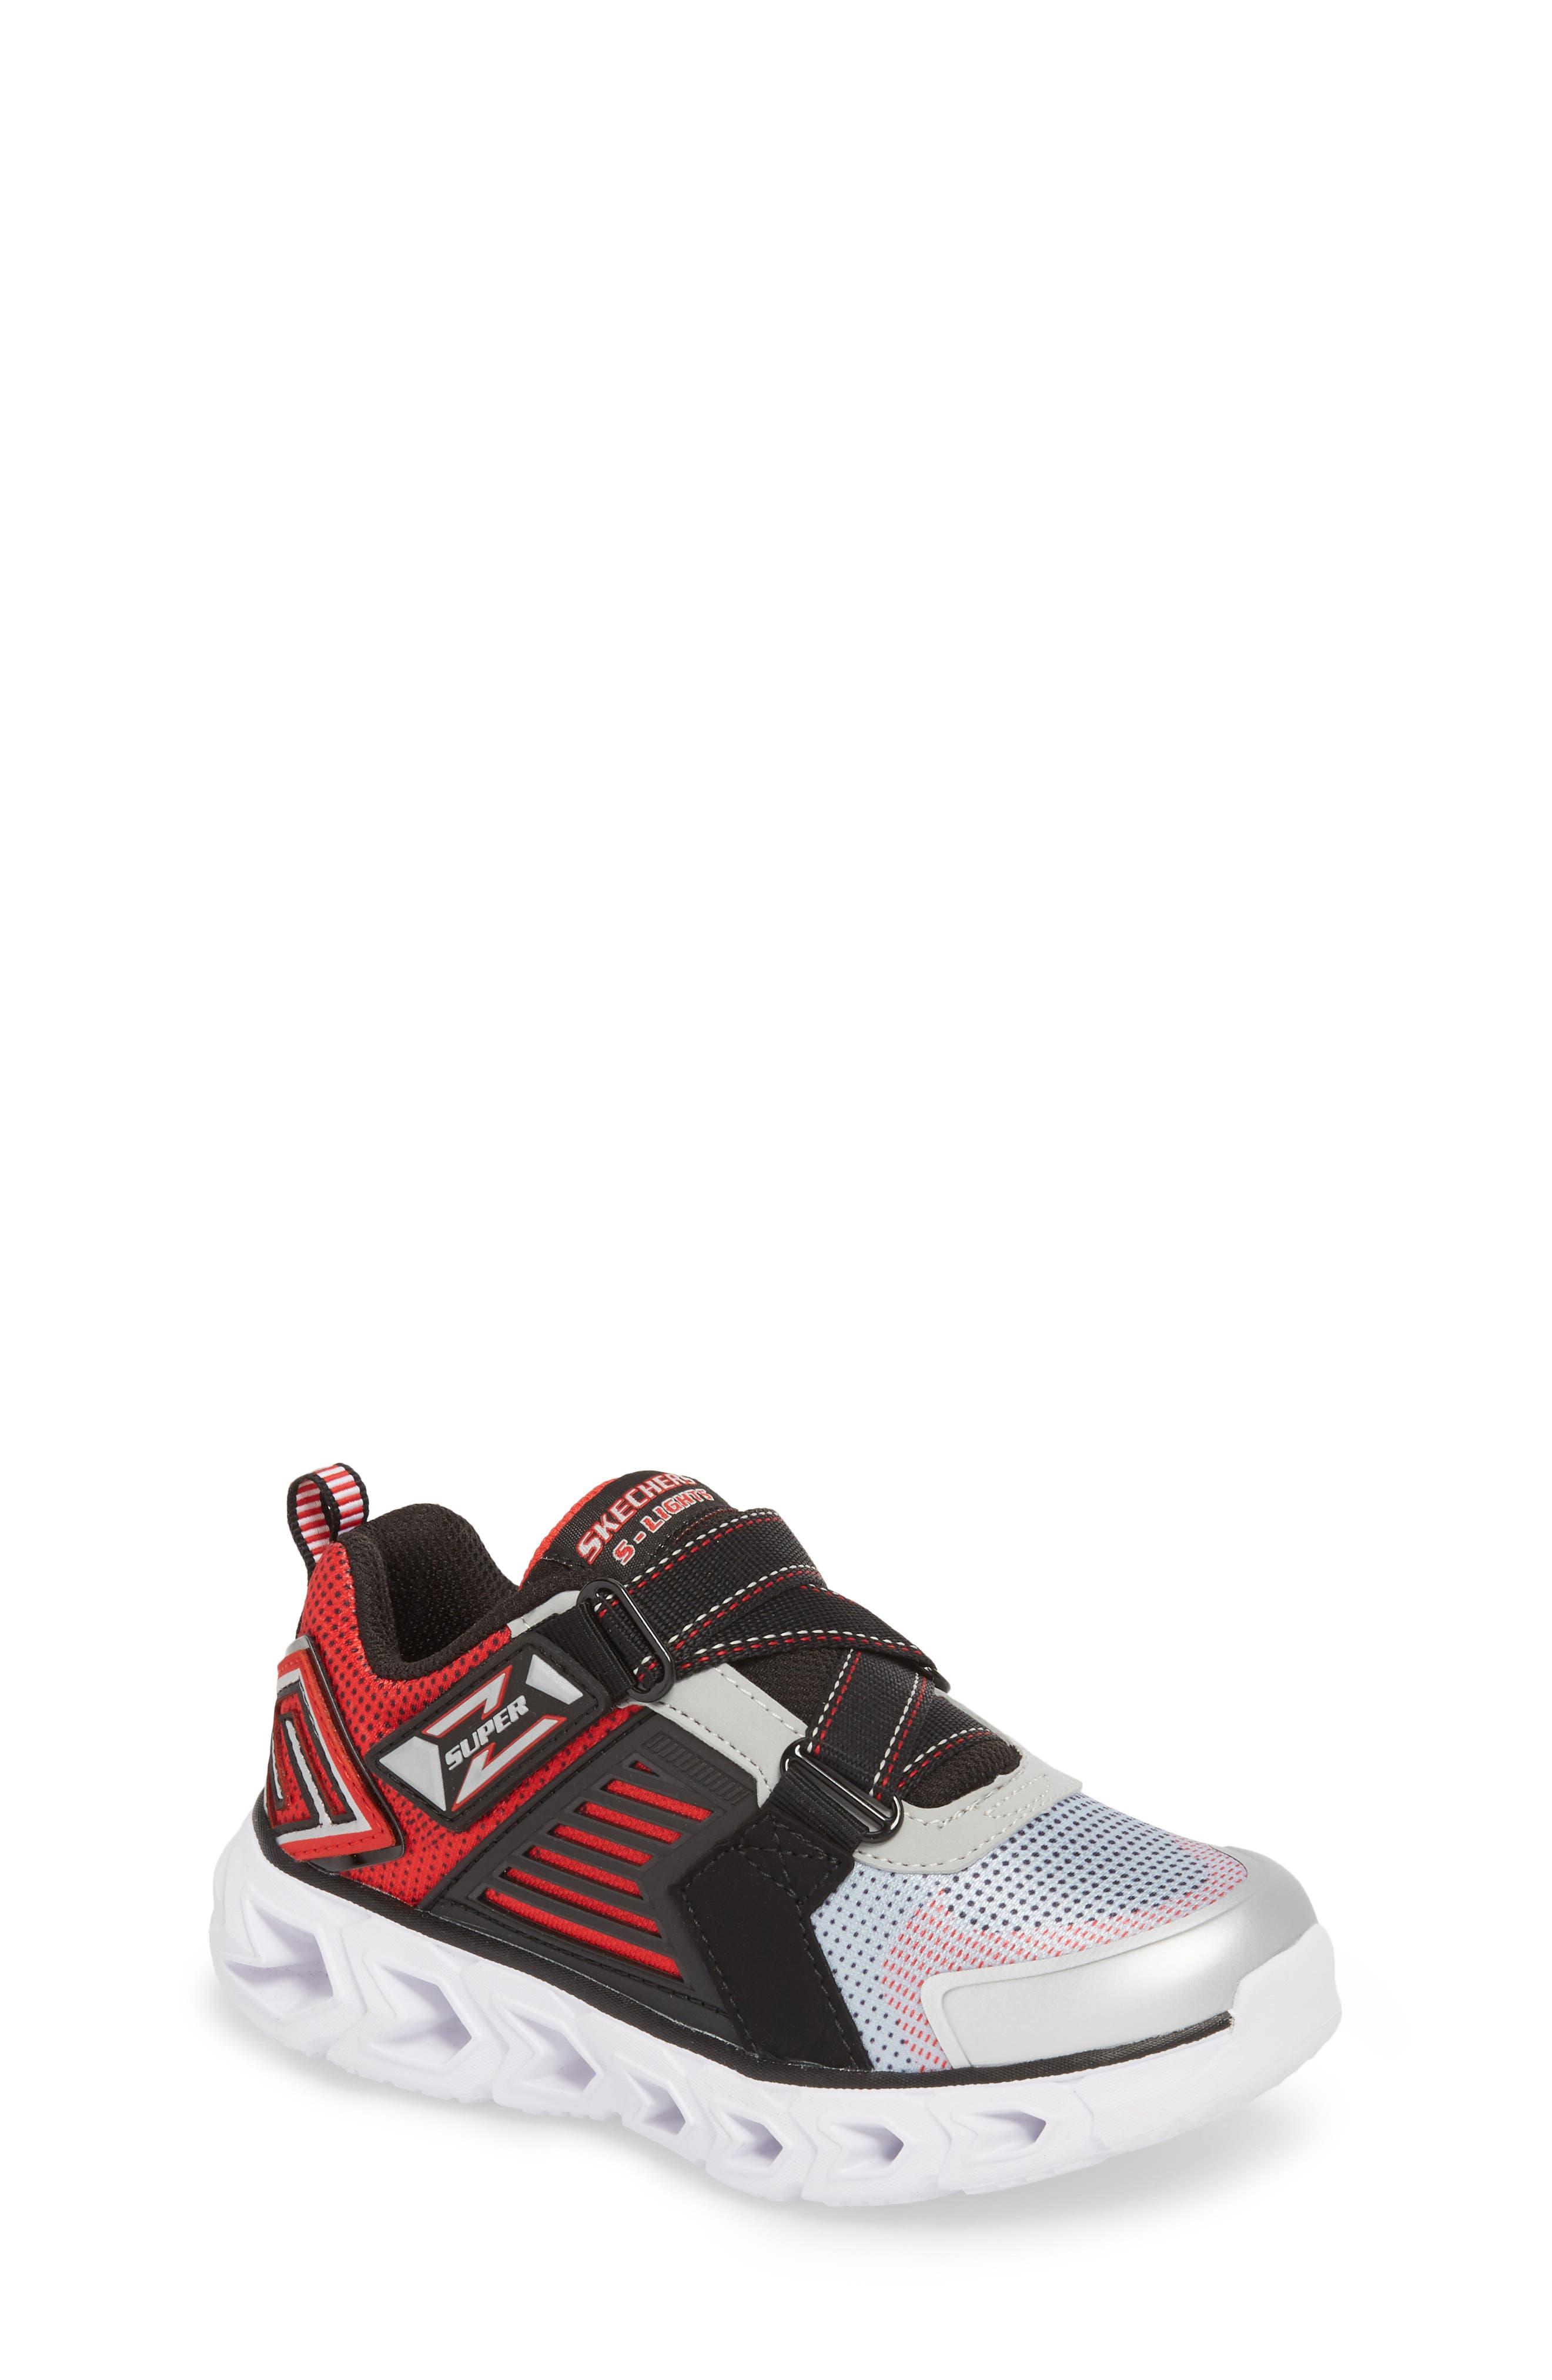 Hypno-Flash 2.0 Rapid Quake Sneakers,                             Main thumbnail 1, color,